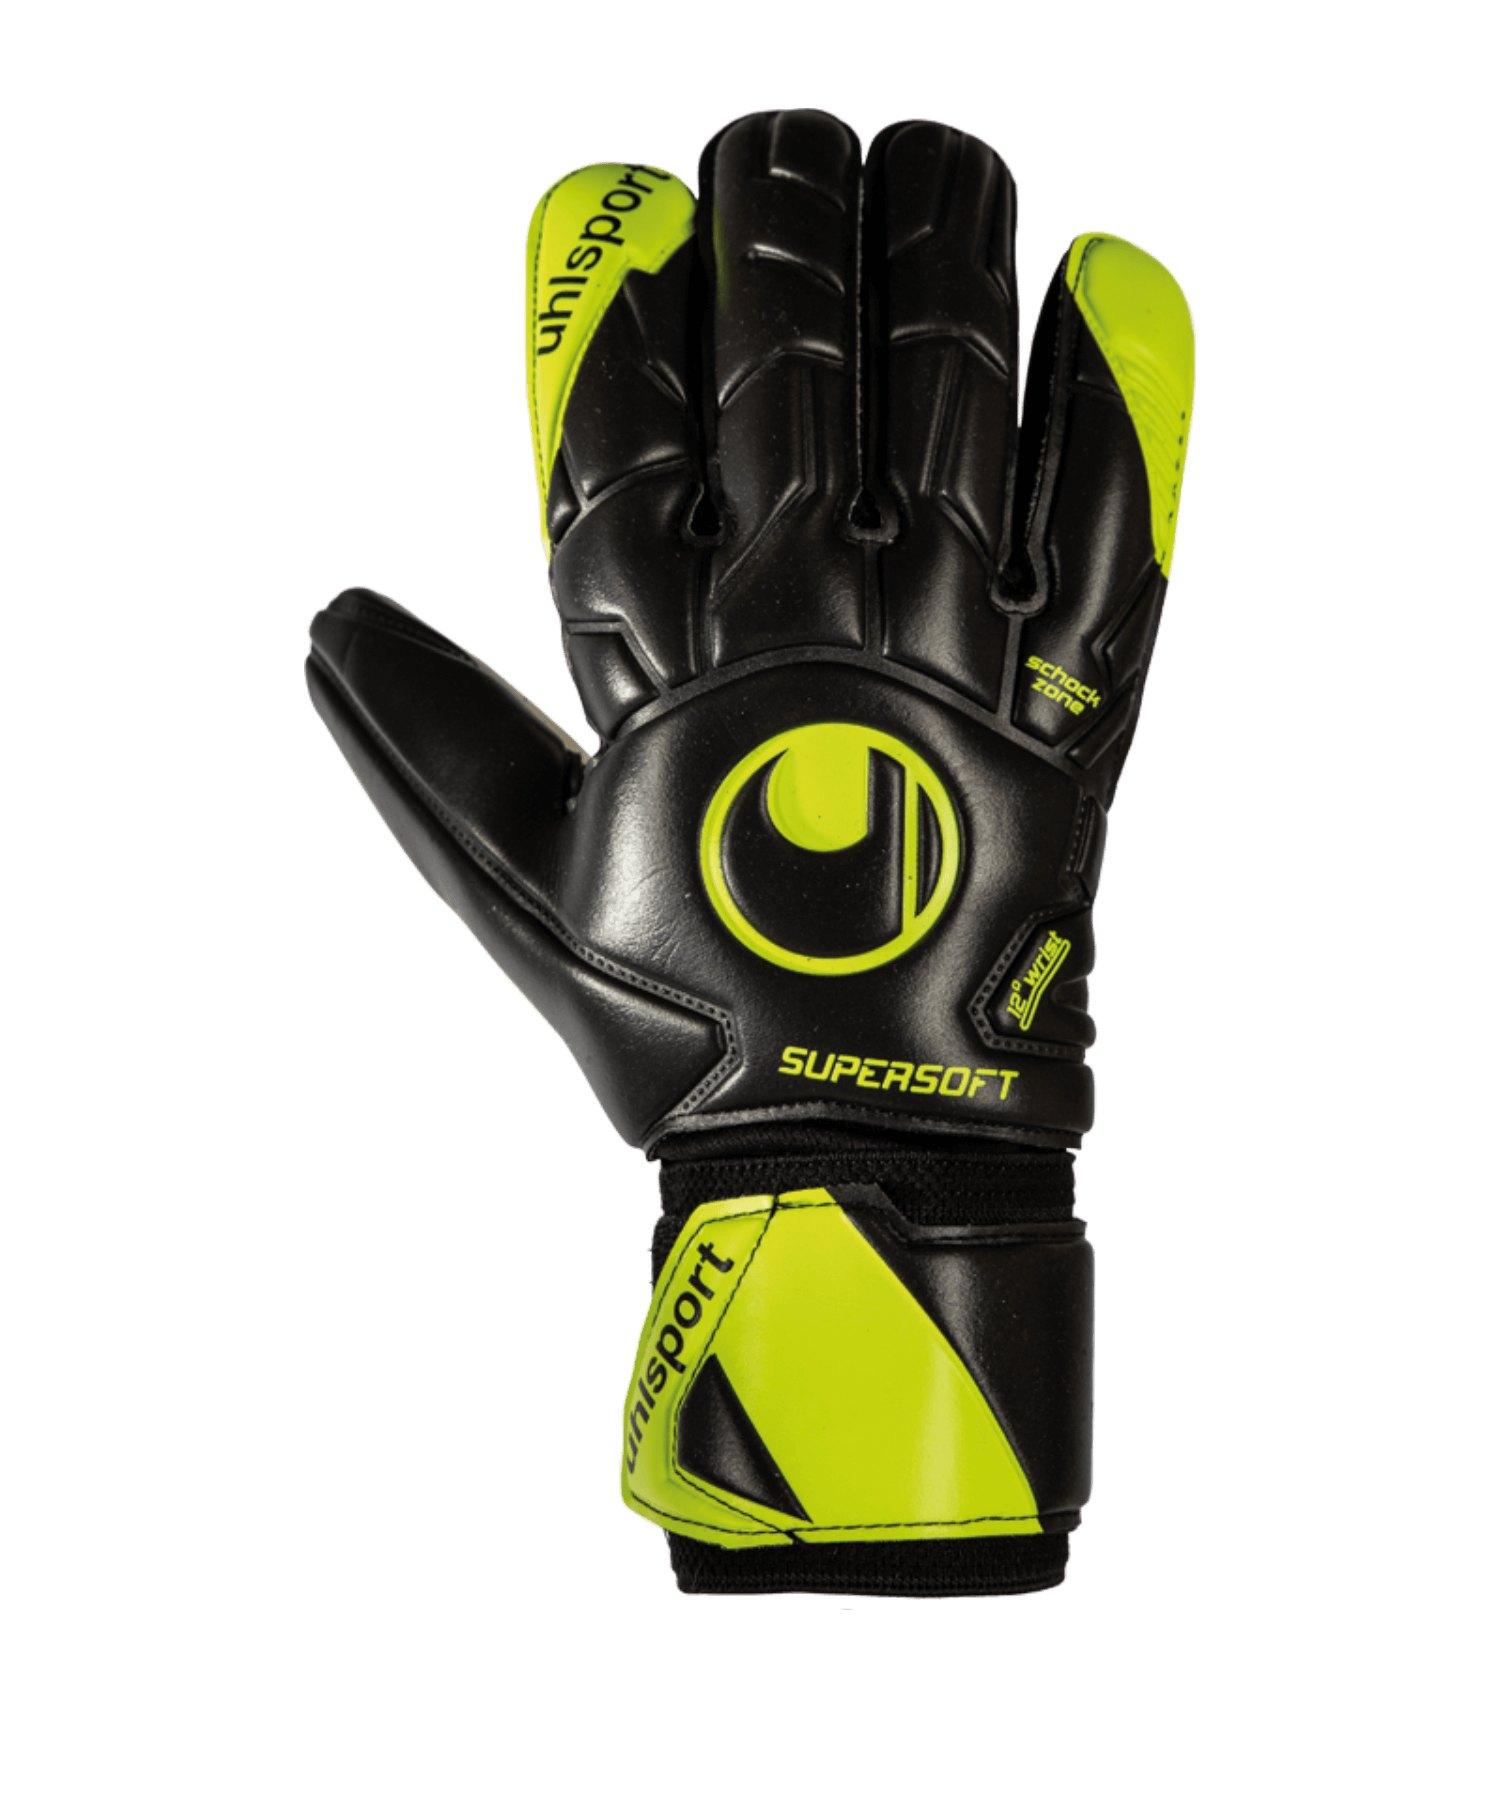 Uhlsport Supersoft HN Flex Frame TW-Handschuh F01 - schwarz